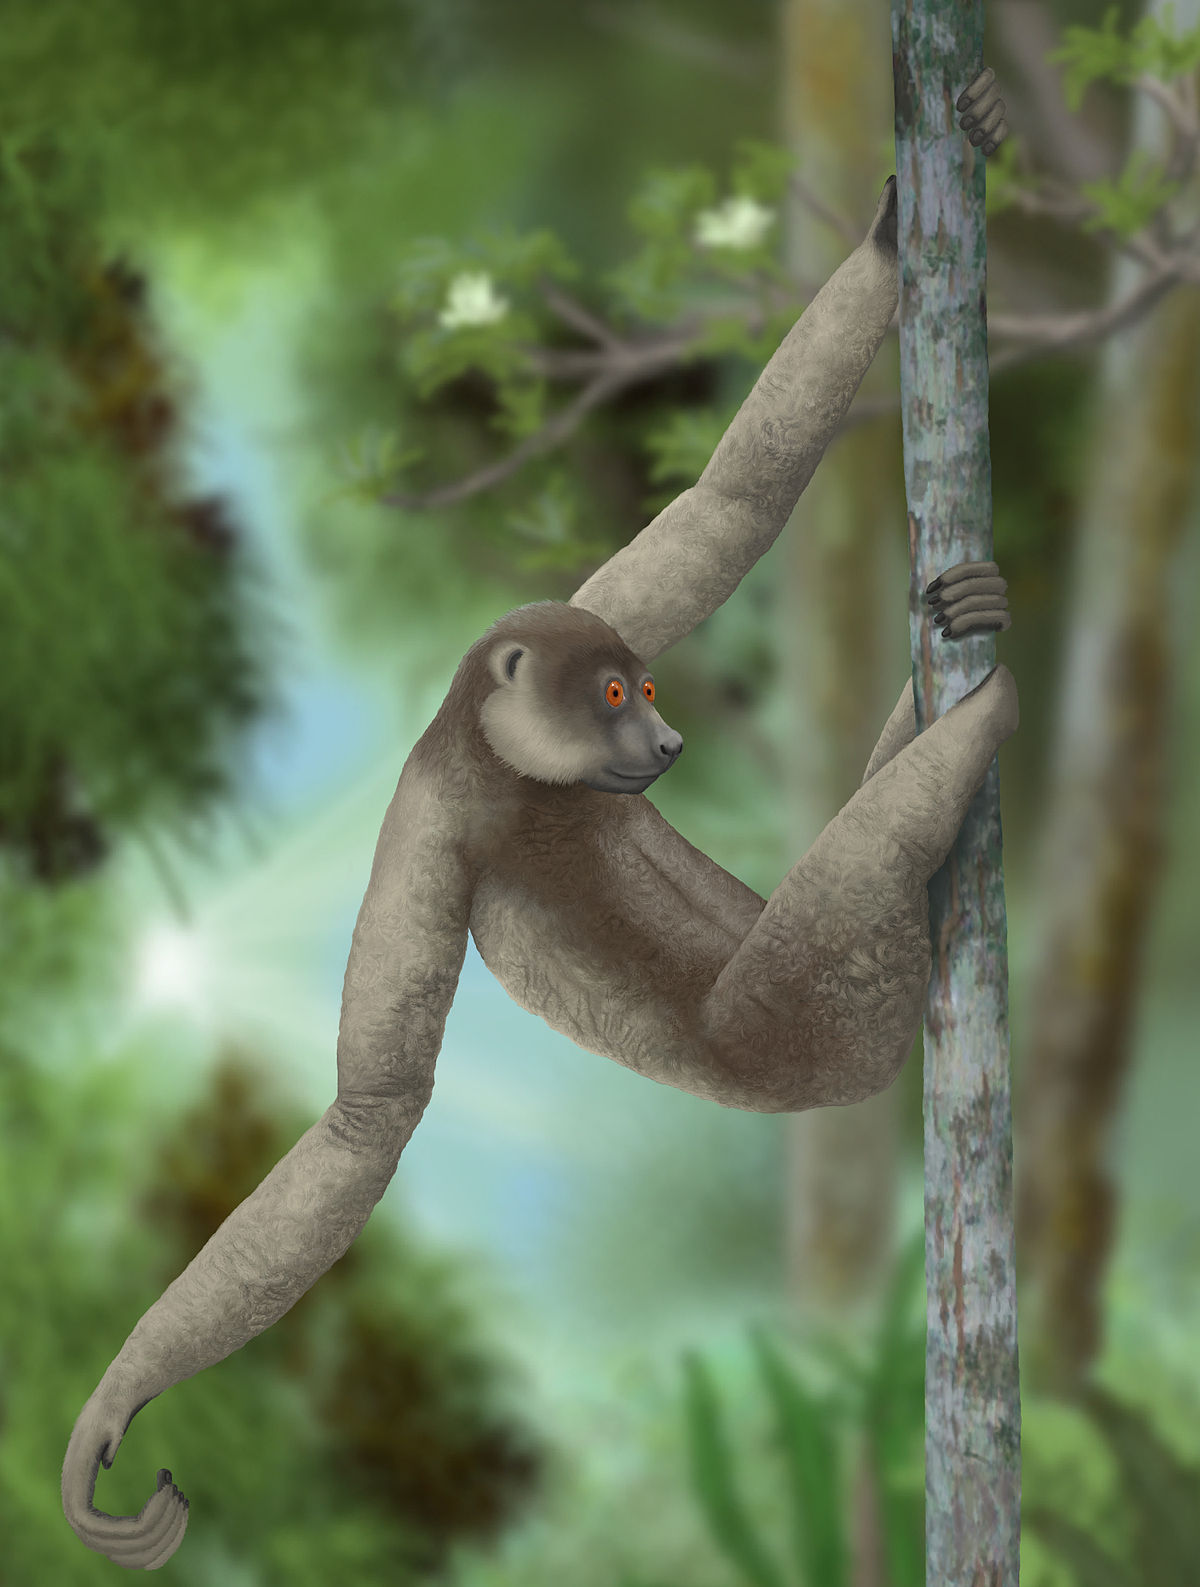 Sloth lemur - Wikipedia